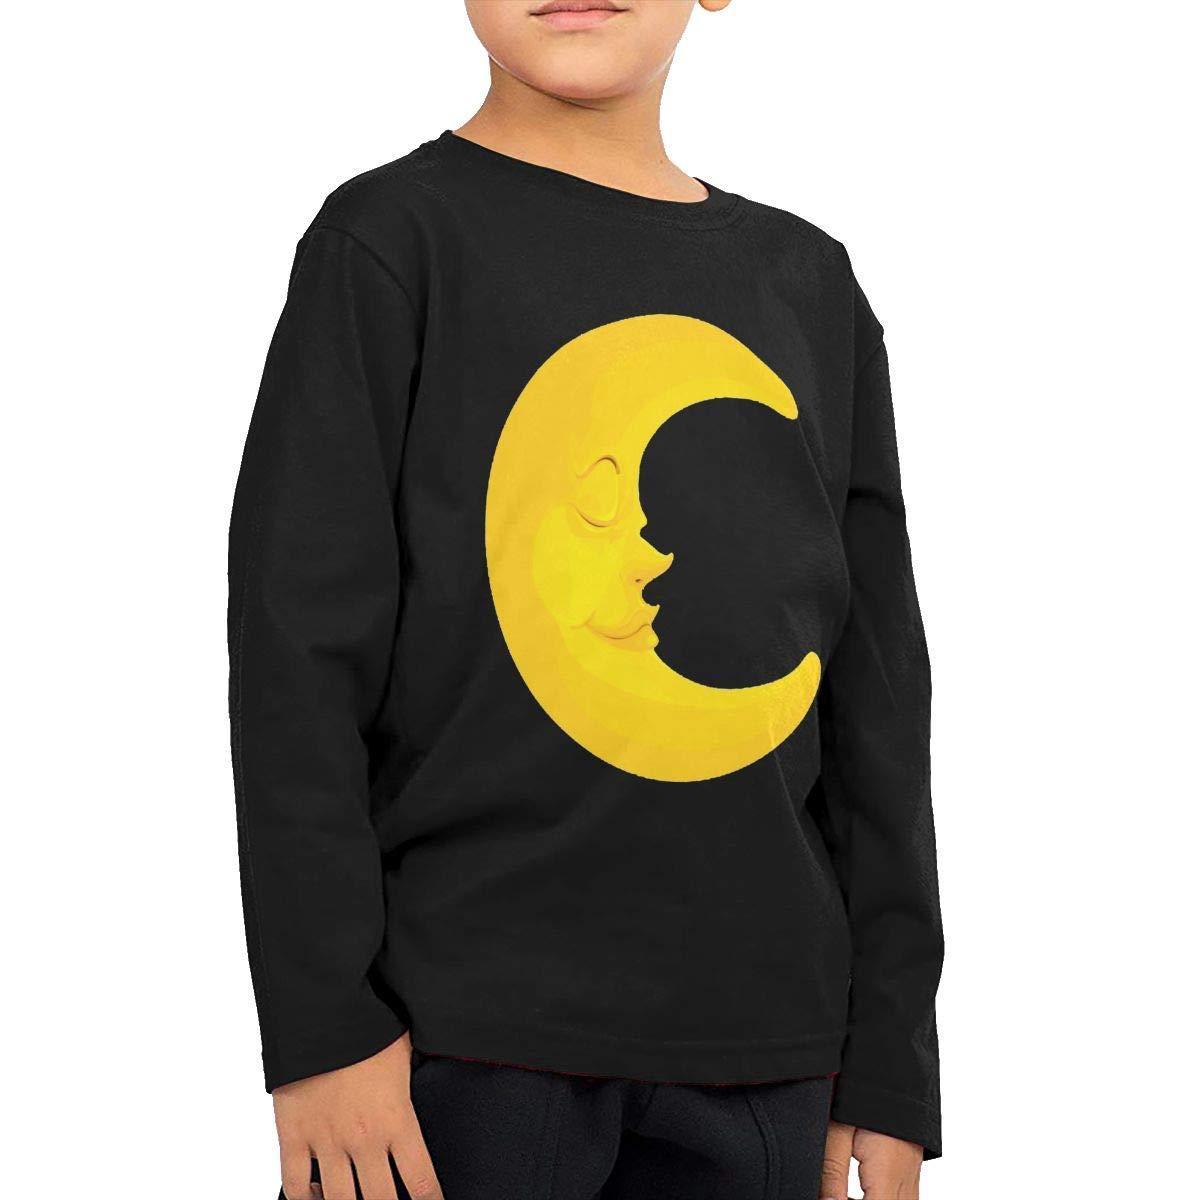 WCHUNMU Sleeping Moon Childrens Cotton Black Long Sleeve Round Neck Boys Or Girls T Shirt